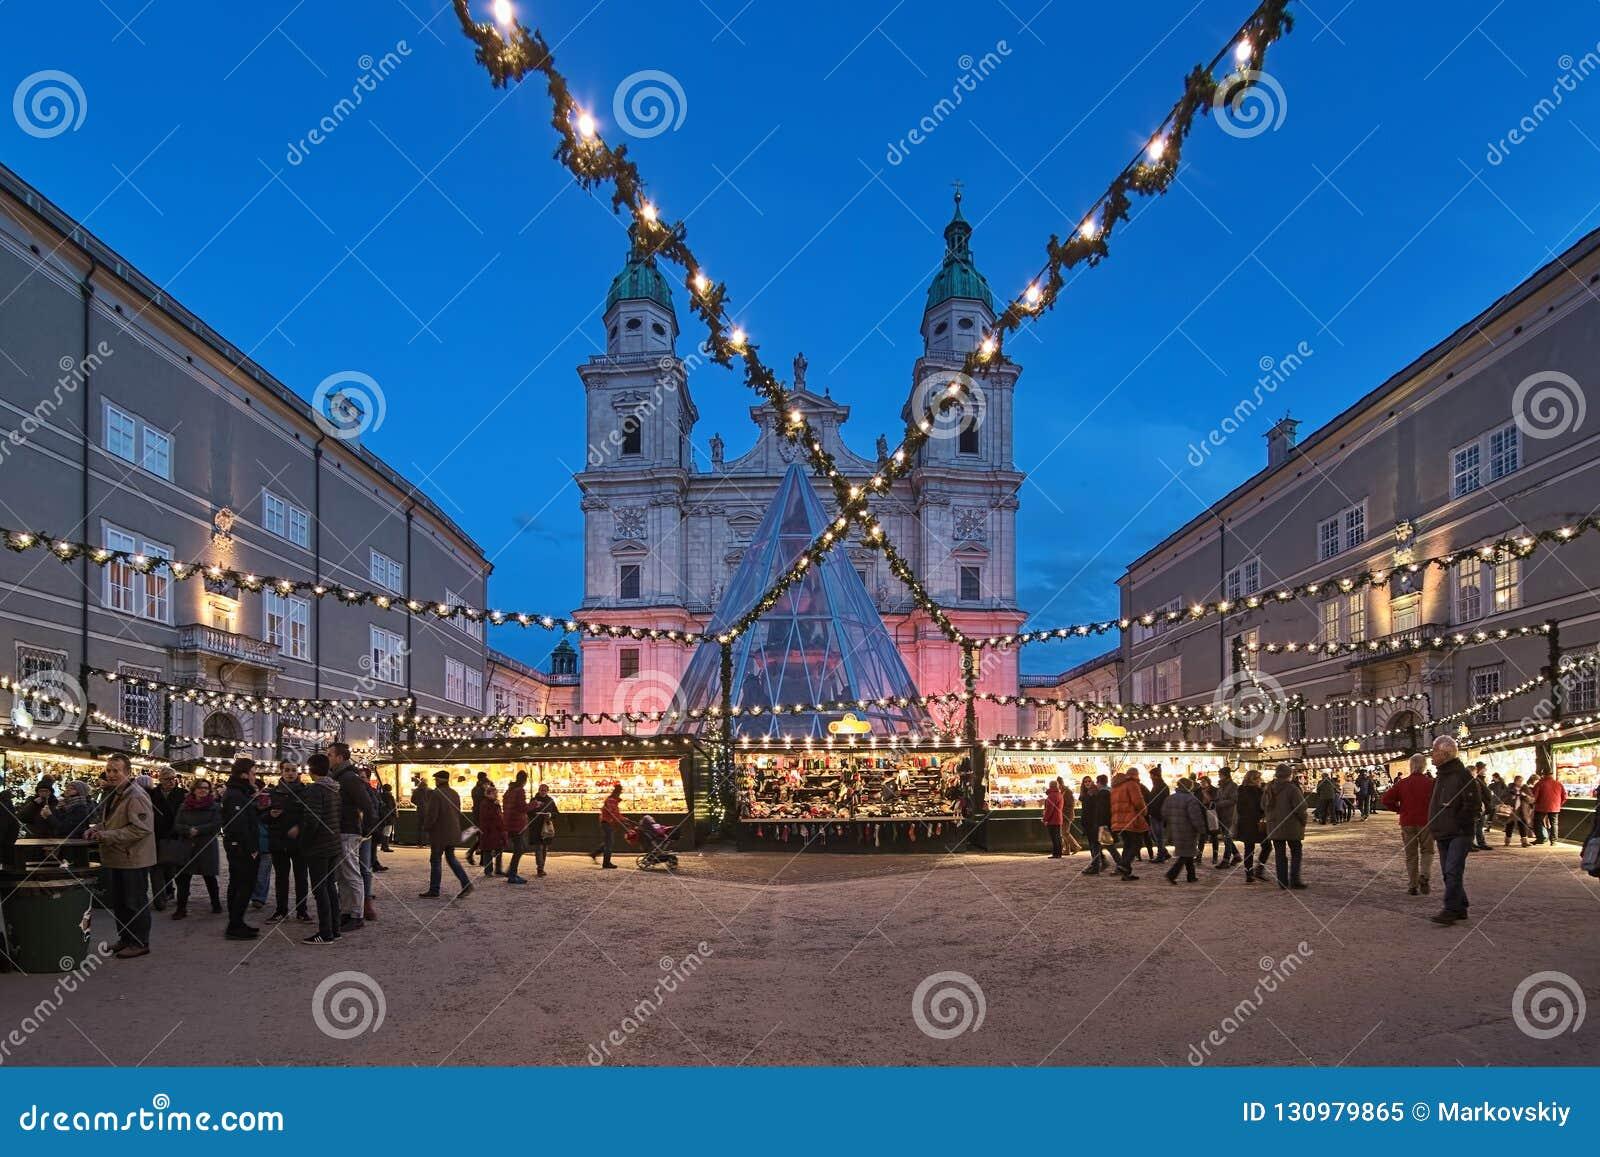 Salzburg Christmas Market.Christmas Market In Front Of Salzburg Cathedral Austria